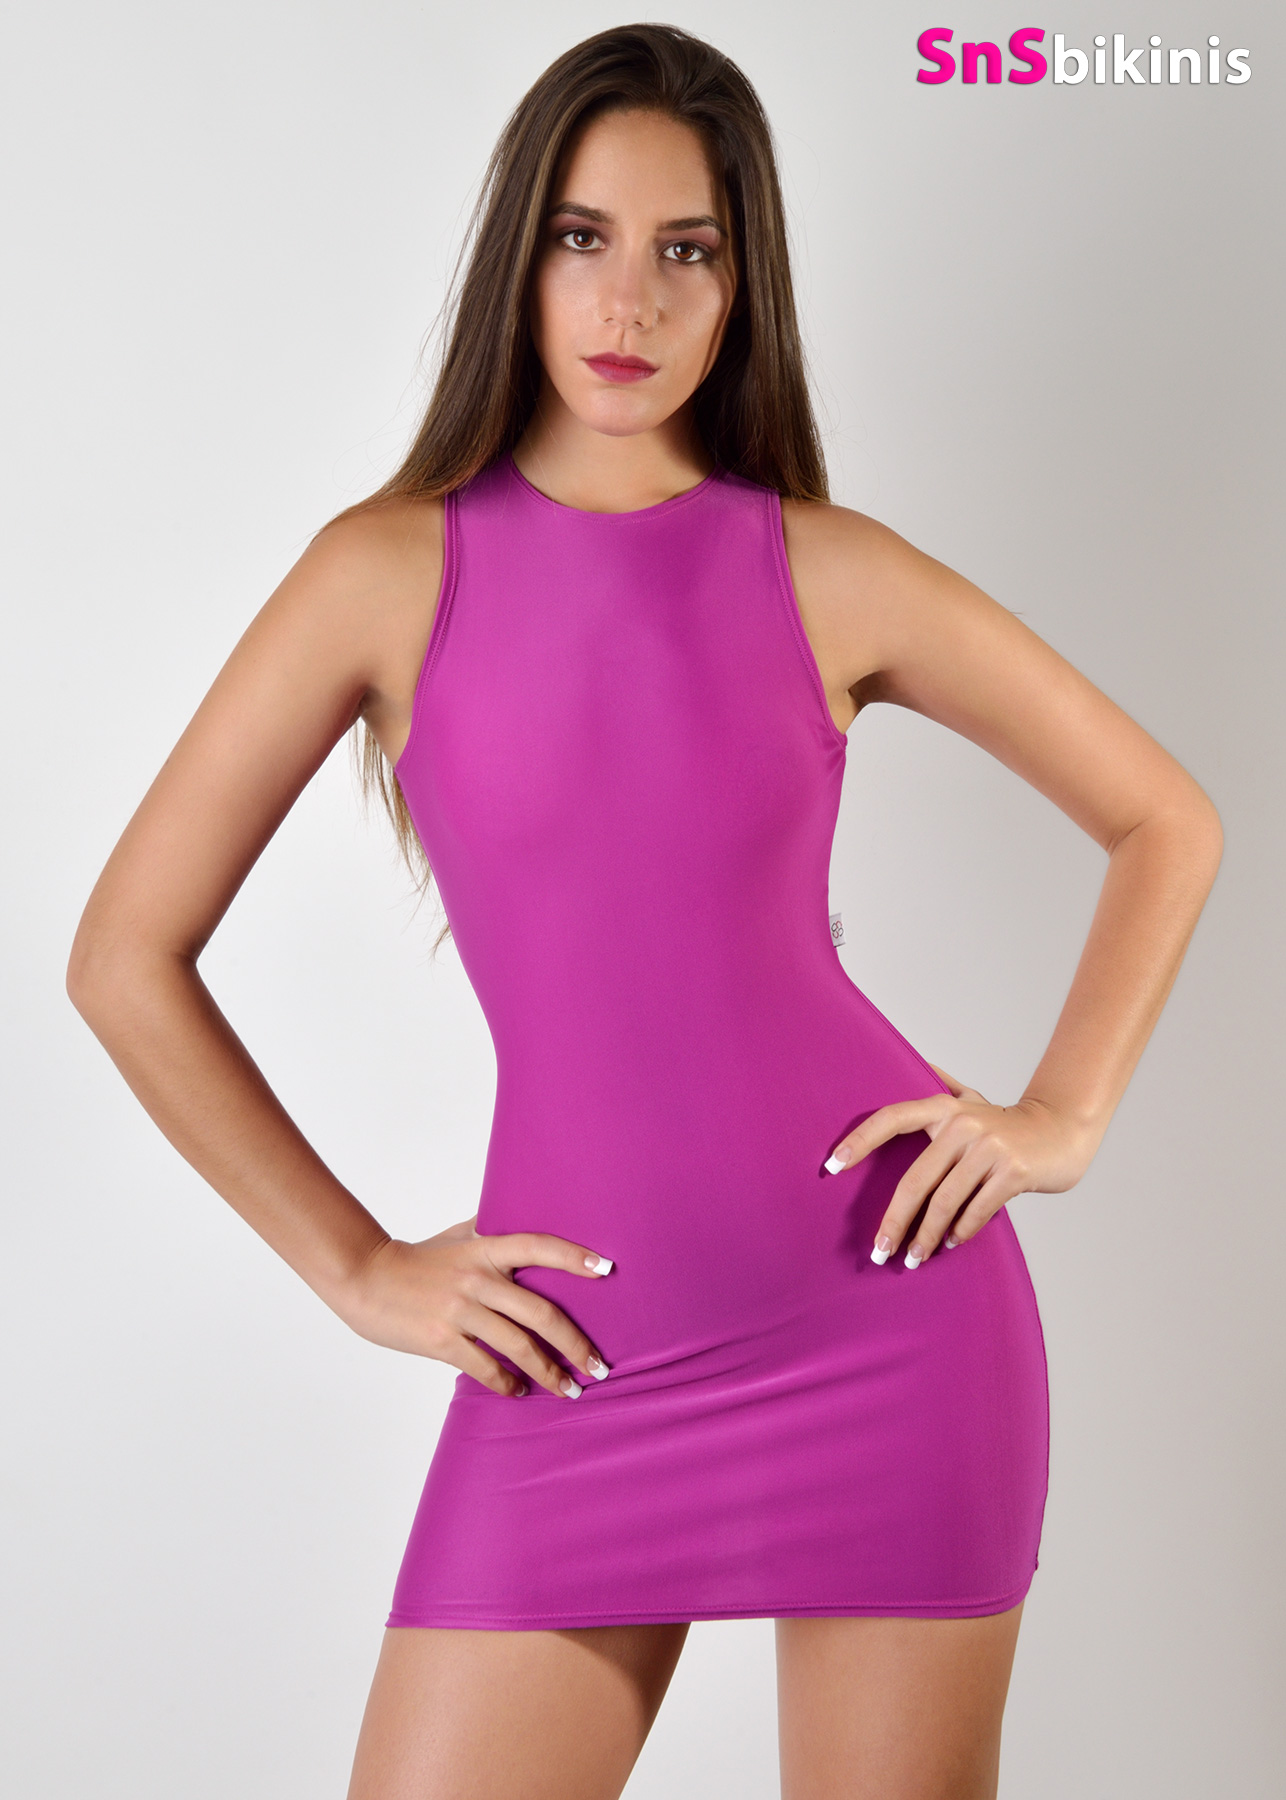 MYSTIQUE Sexy Mini Dress - $84.00 : SnSbikinis Online ...